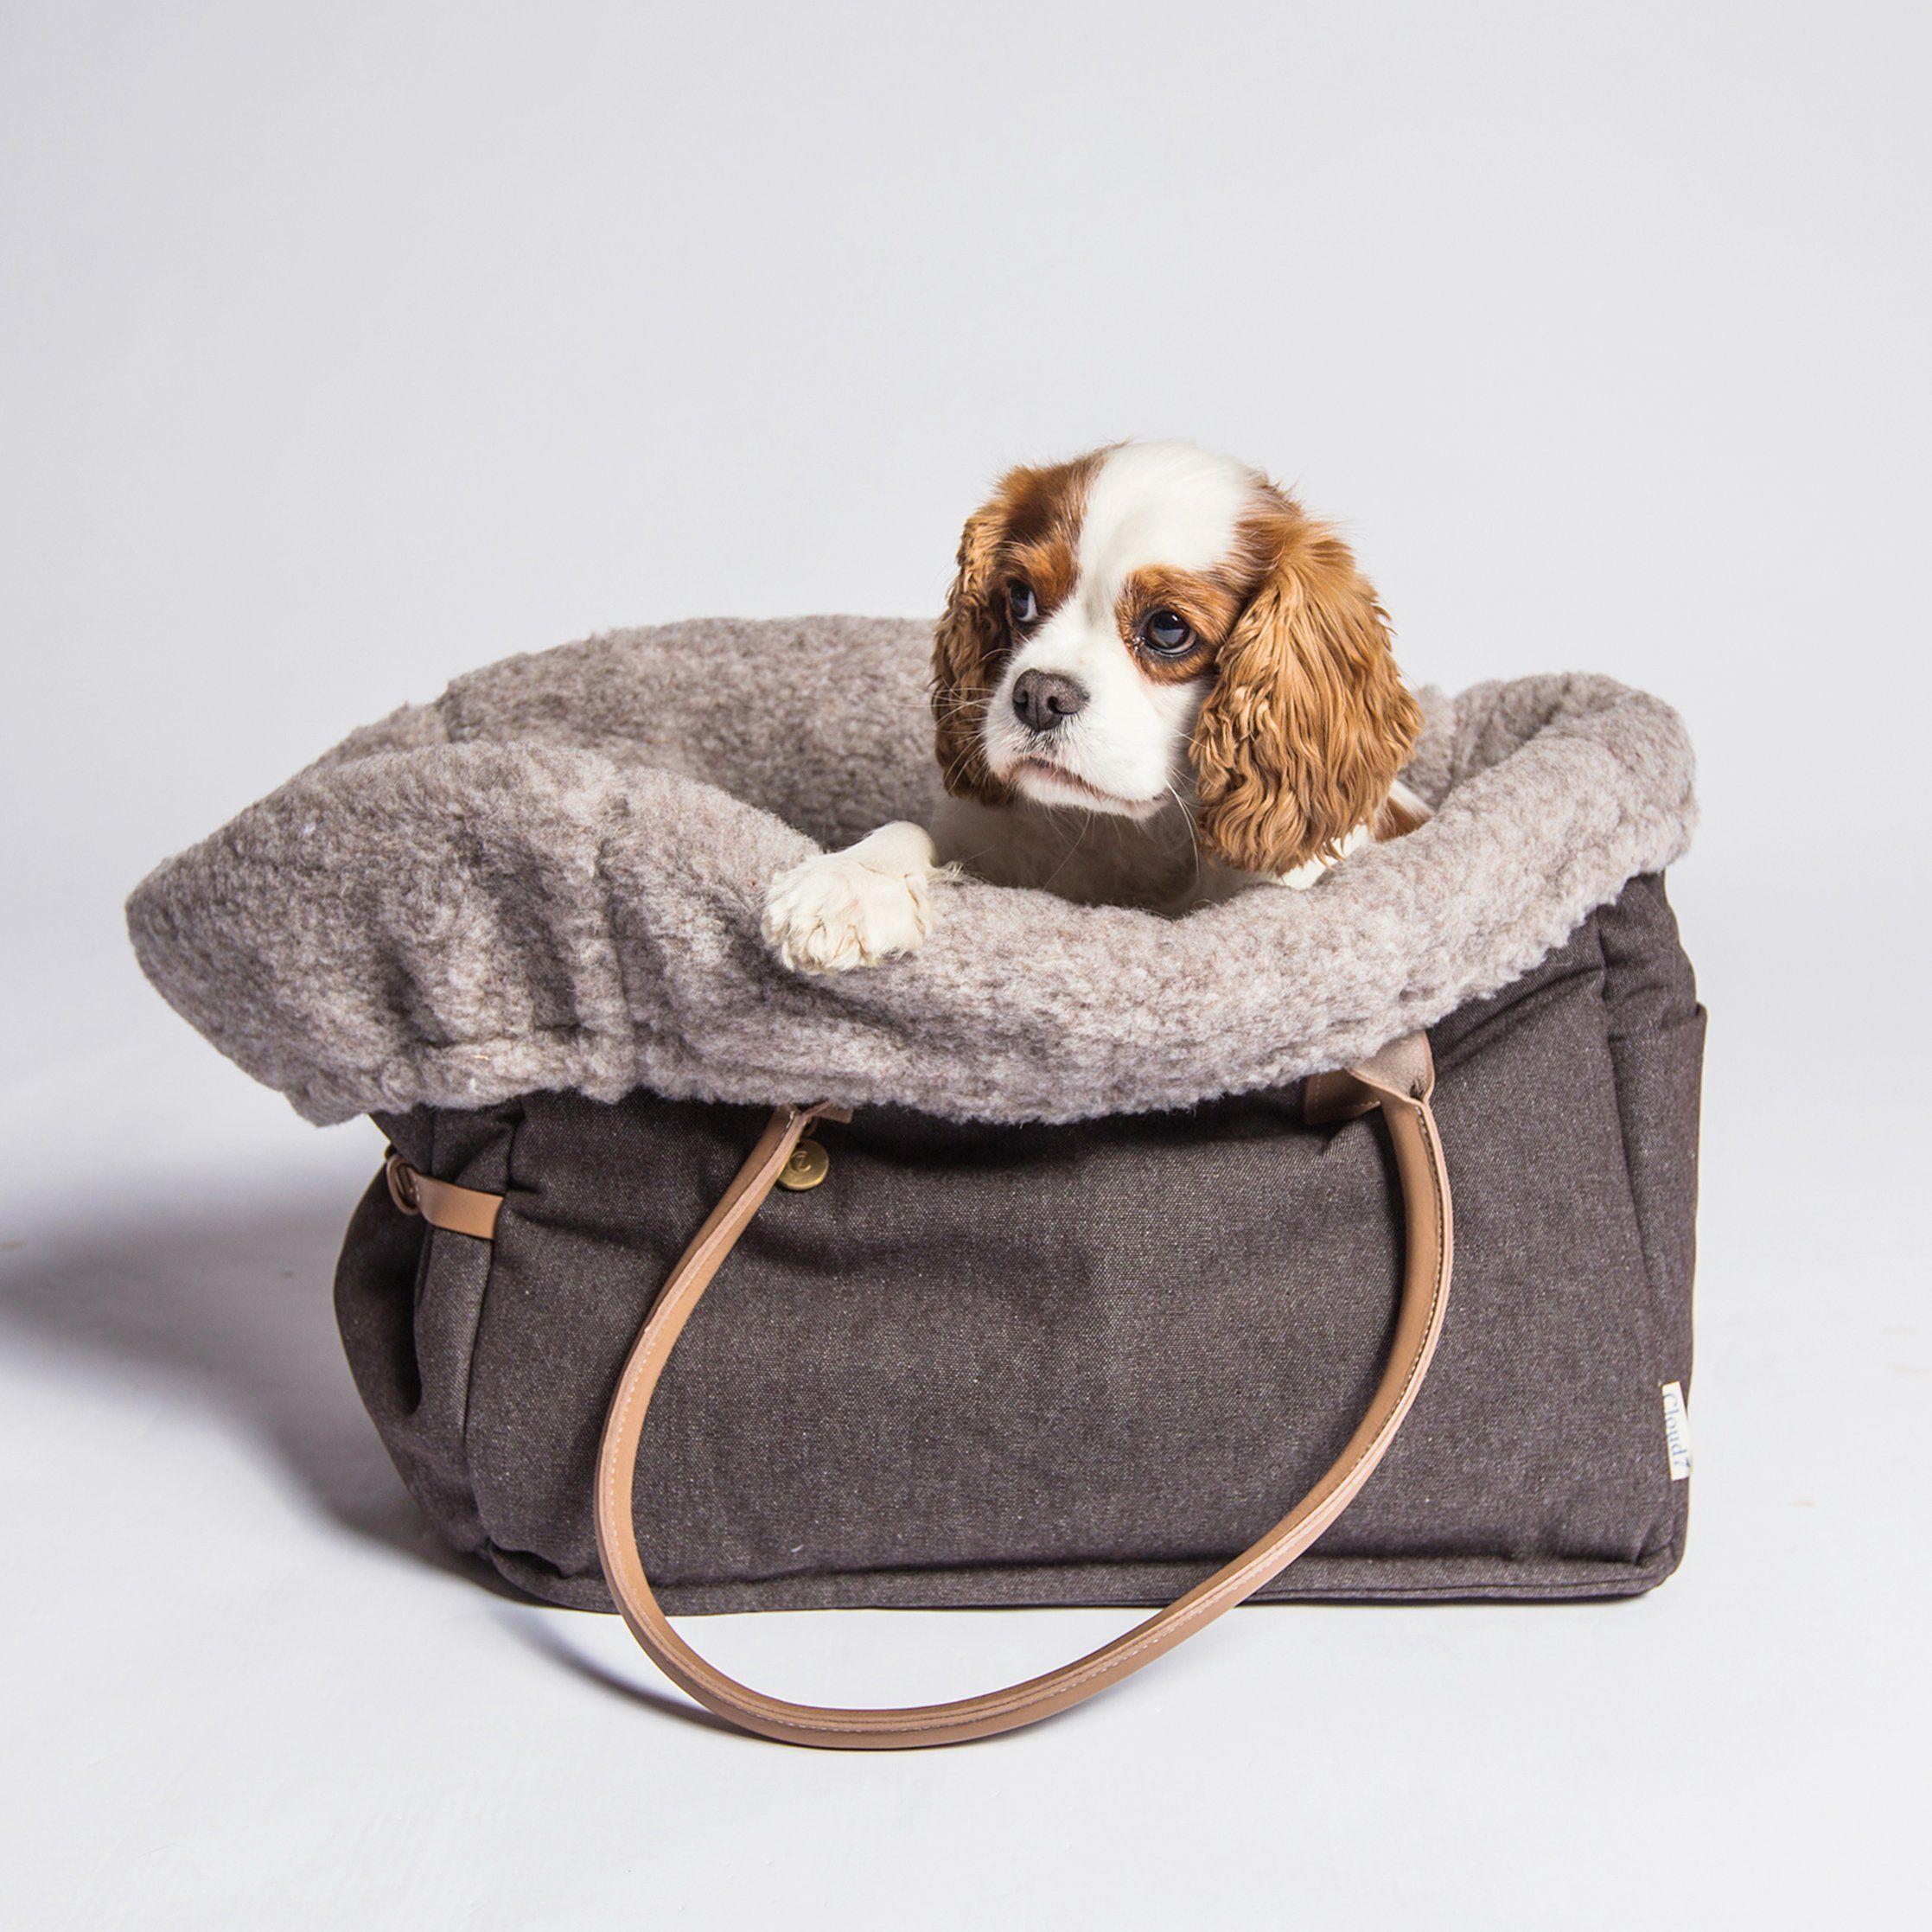 Cloud7 Heather Brown Dog Carrier Dog Carrier Brown Dog Luxury Dog Carrier